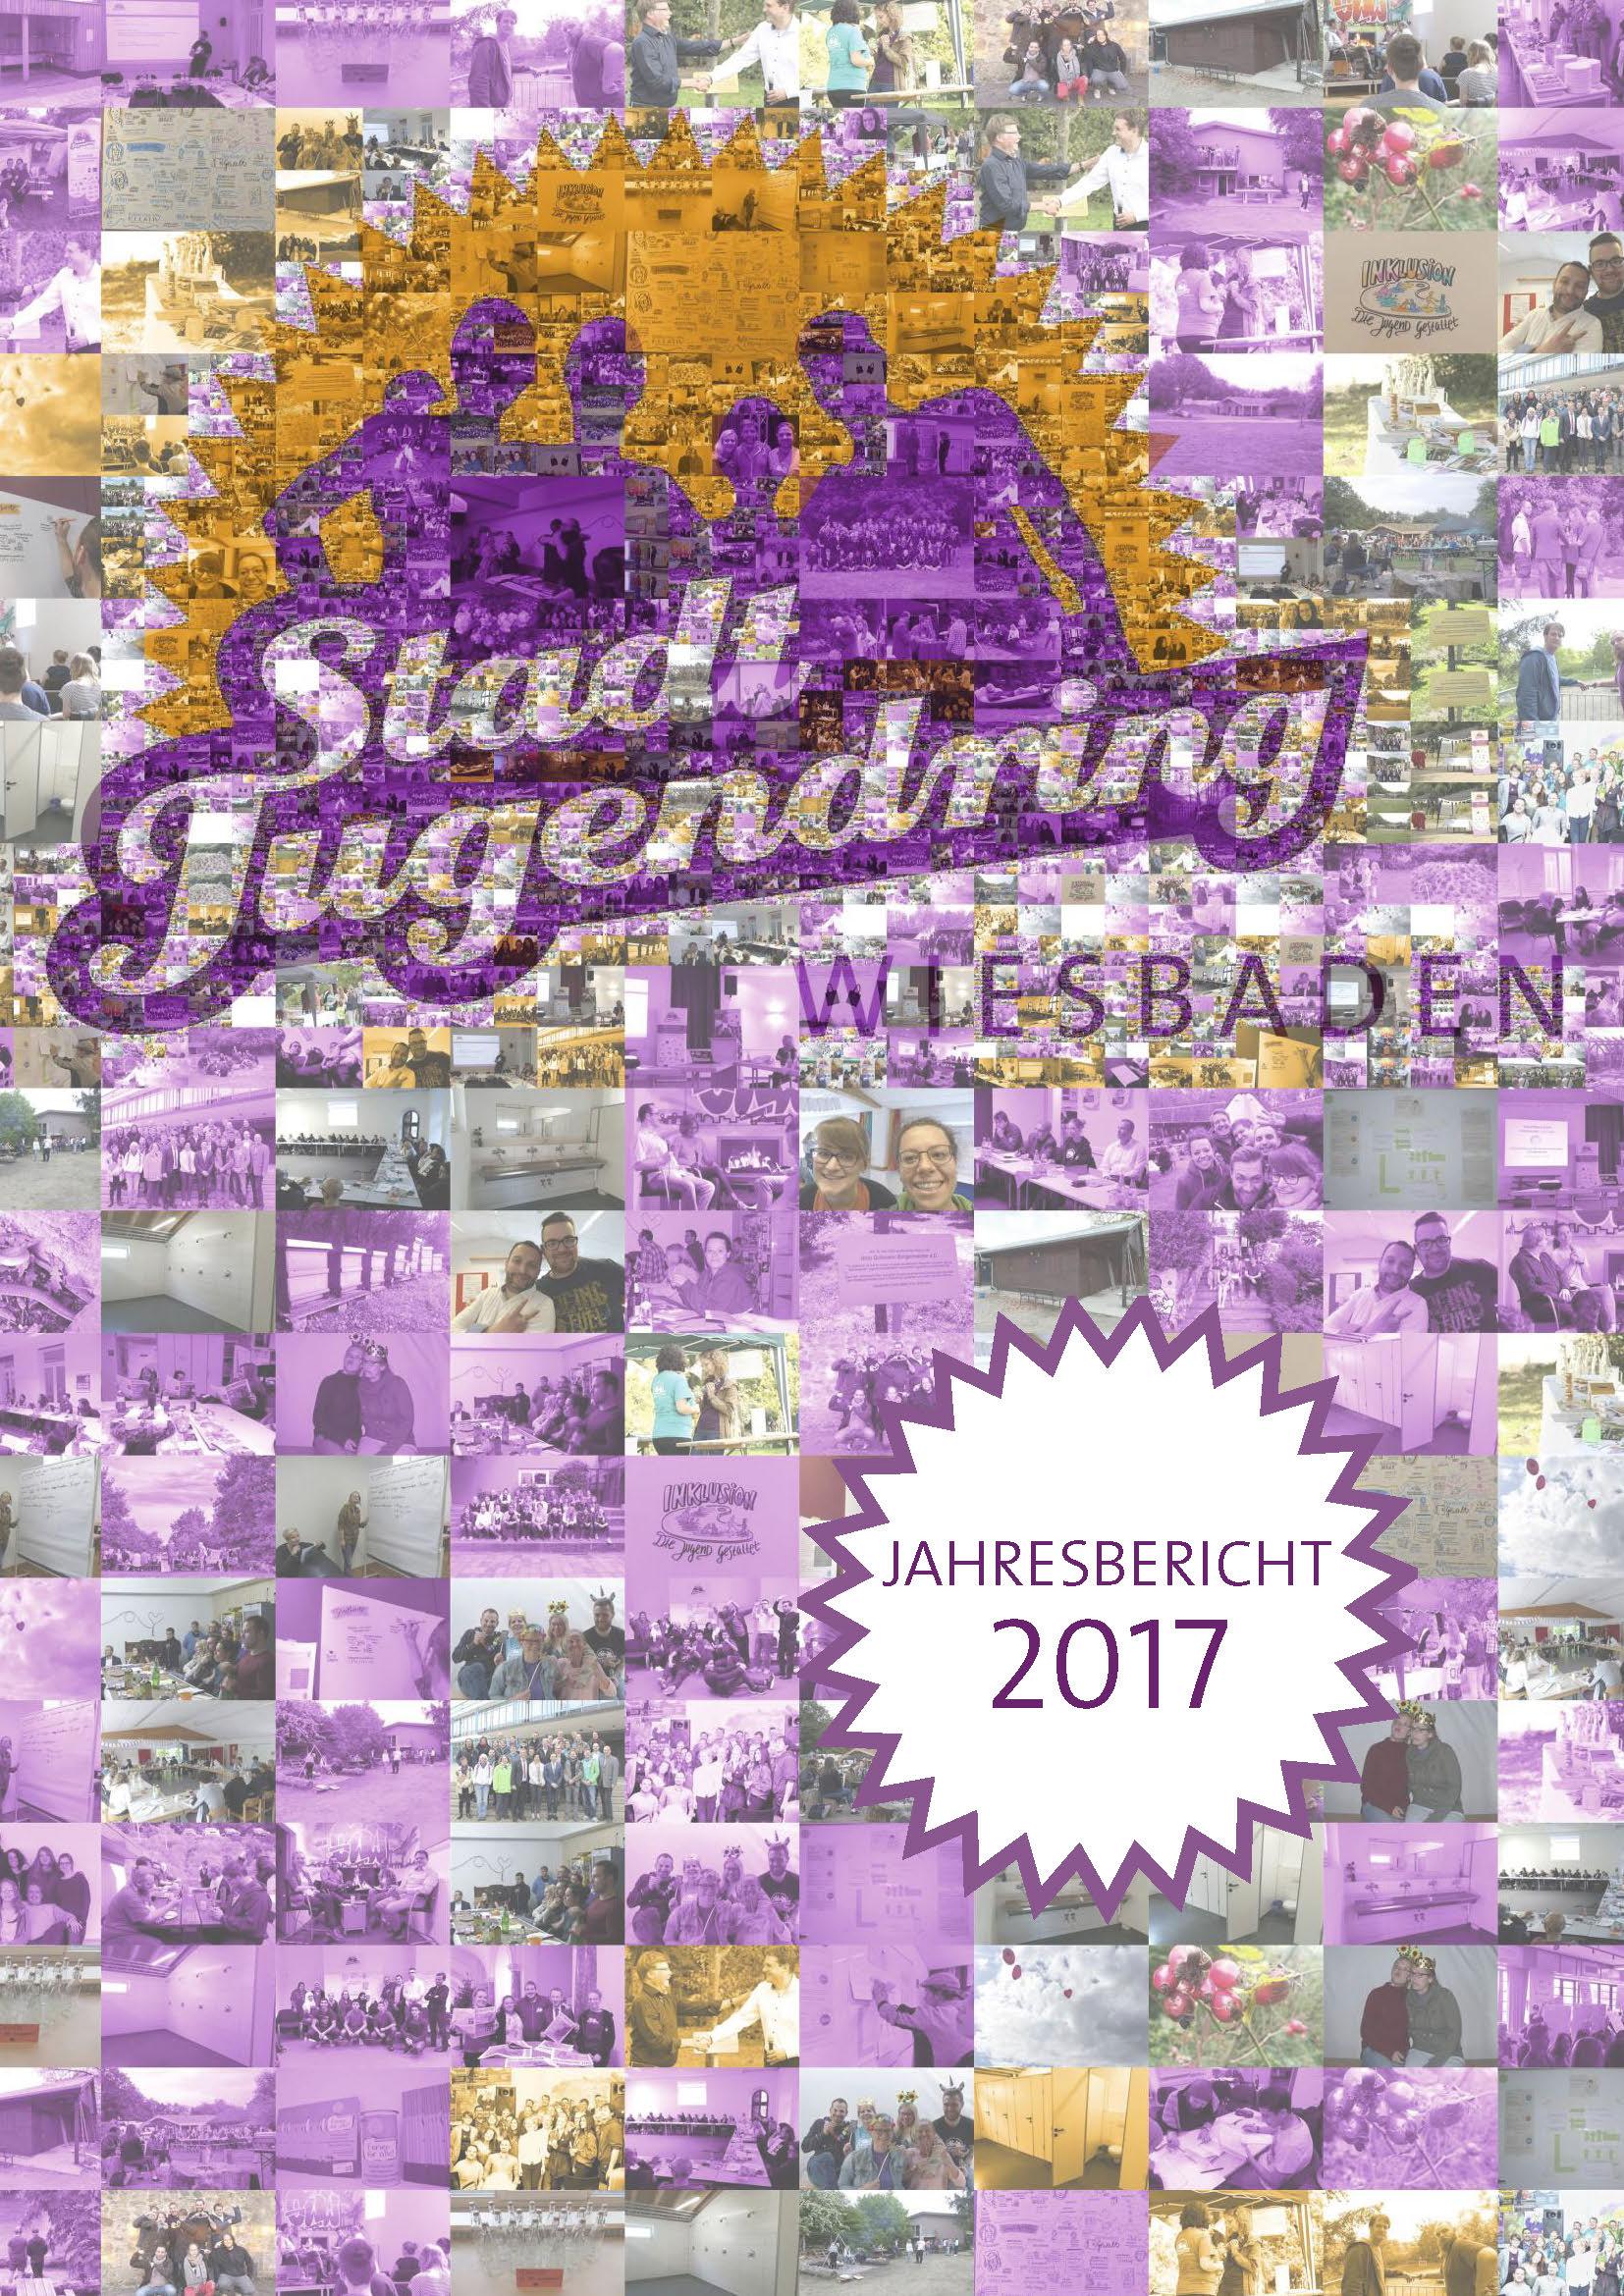 SJR Jahresbericht 2017